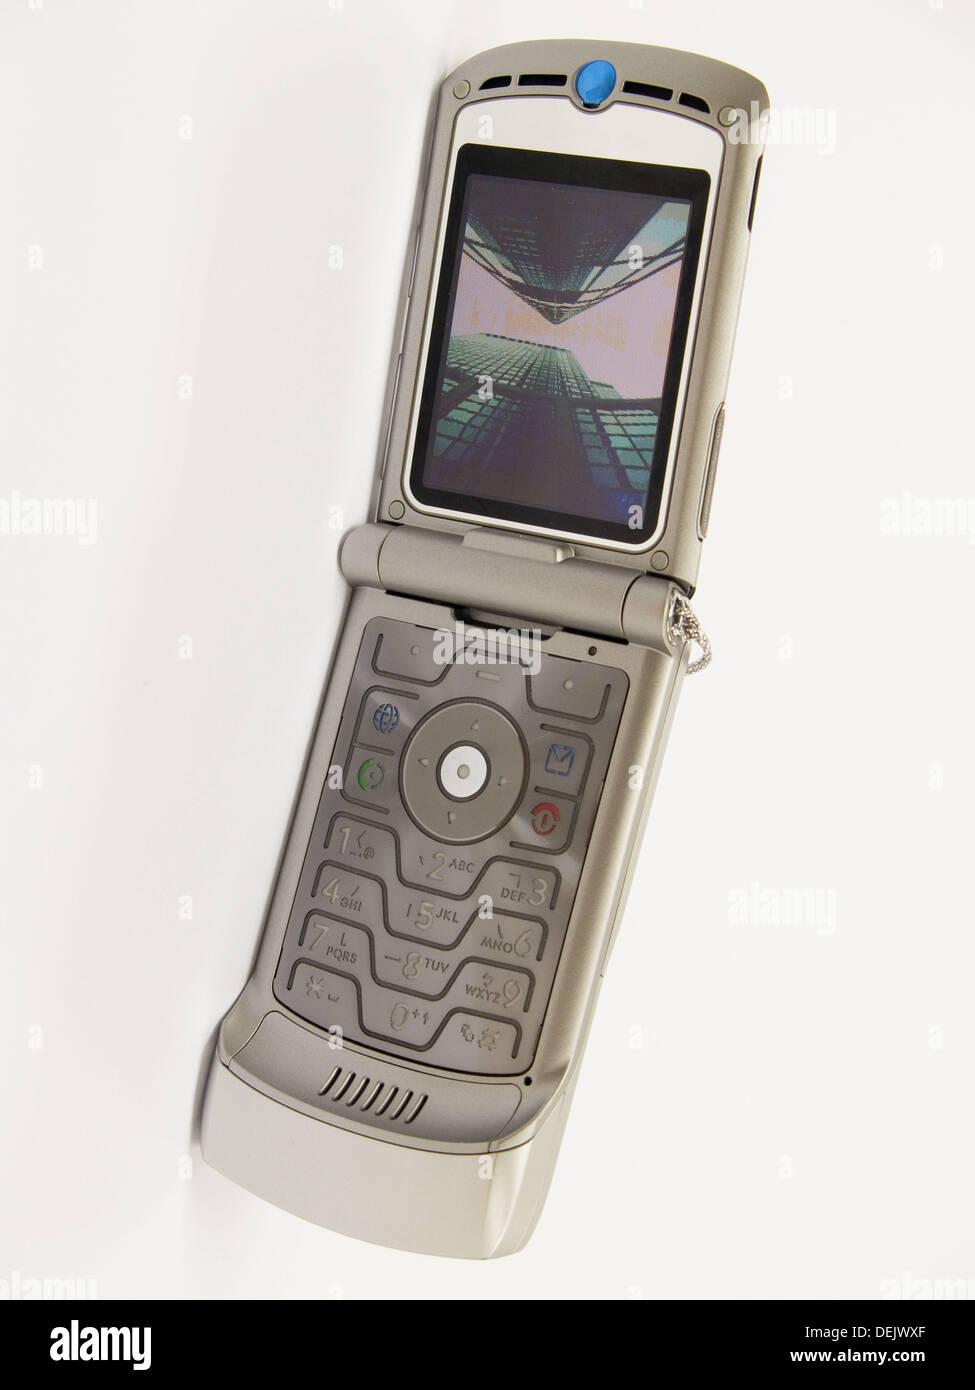 latest motorola cell phone on seemless white background - Stock Image